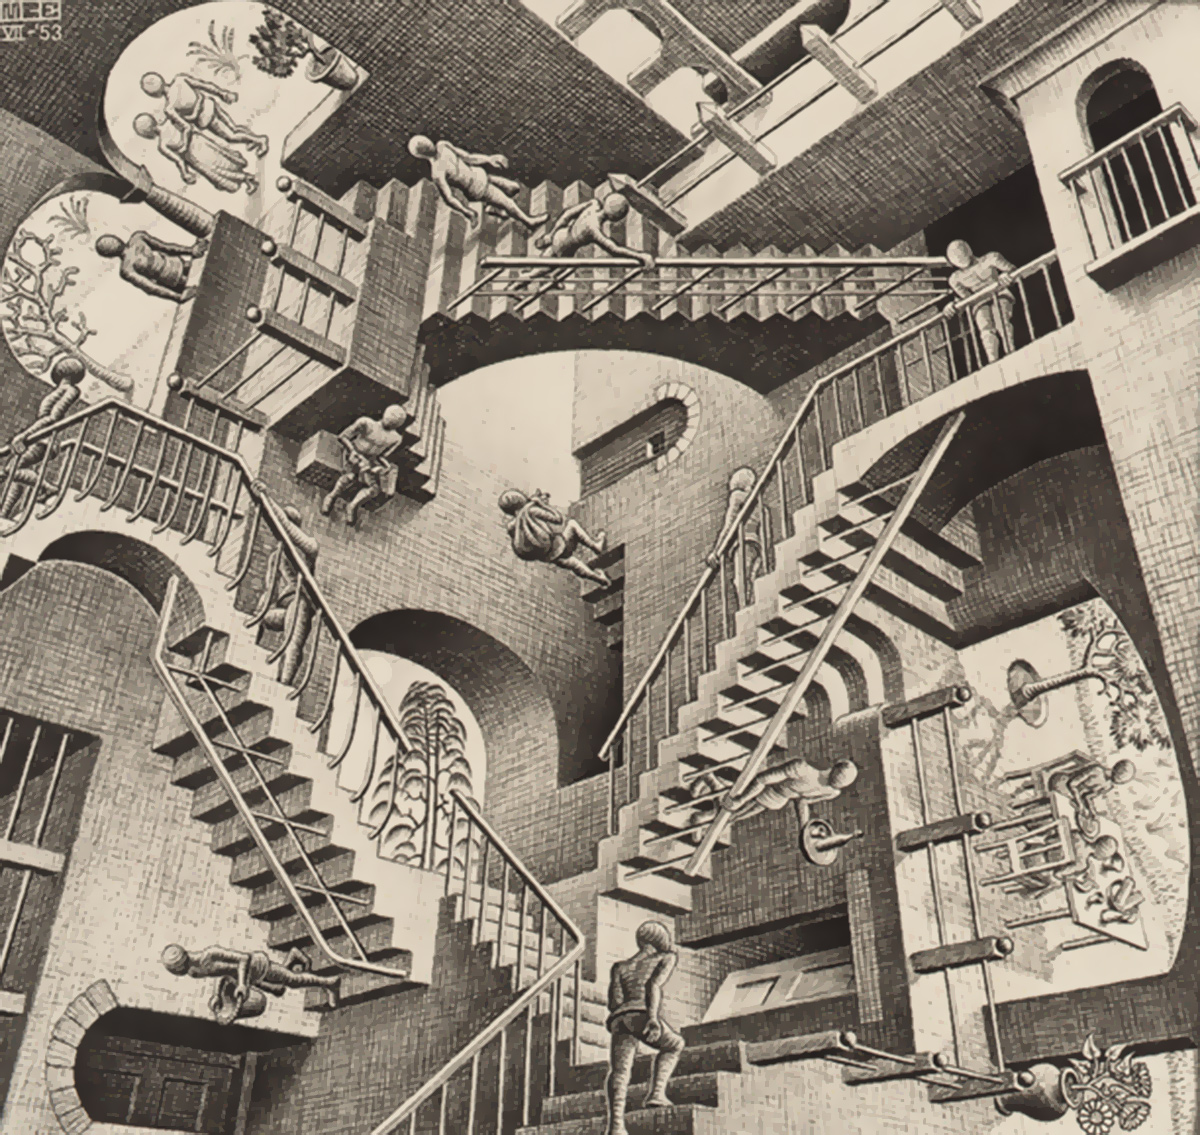 Relatividade-M.C.-Escher-Foundation-Baarn-Netherlands